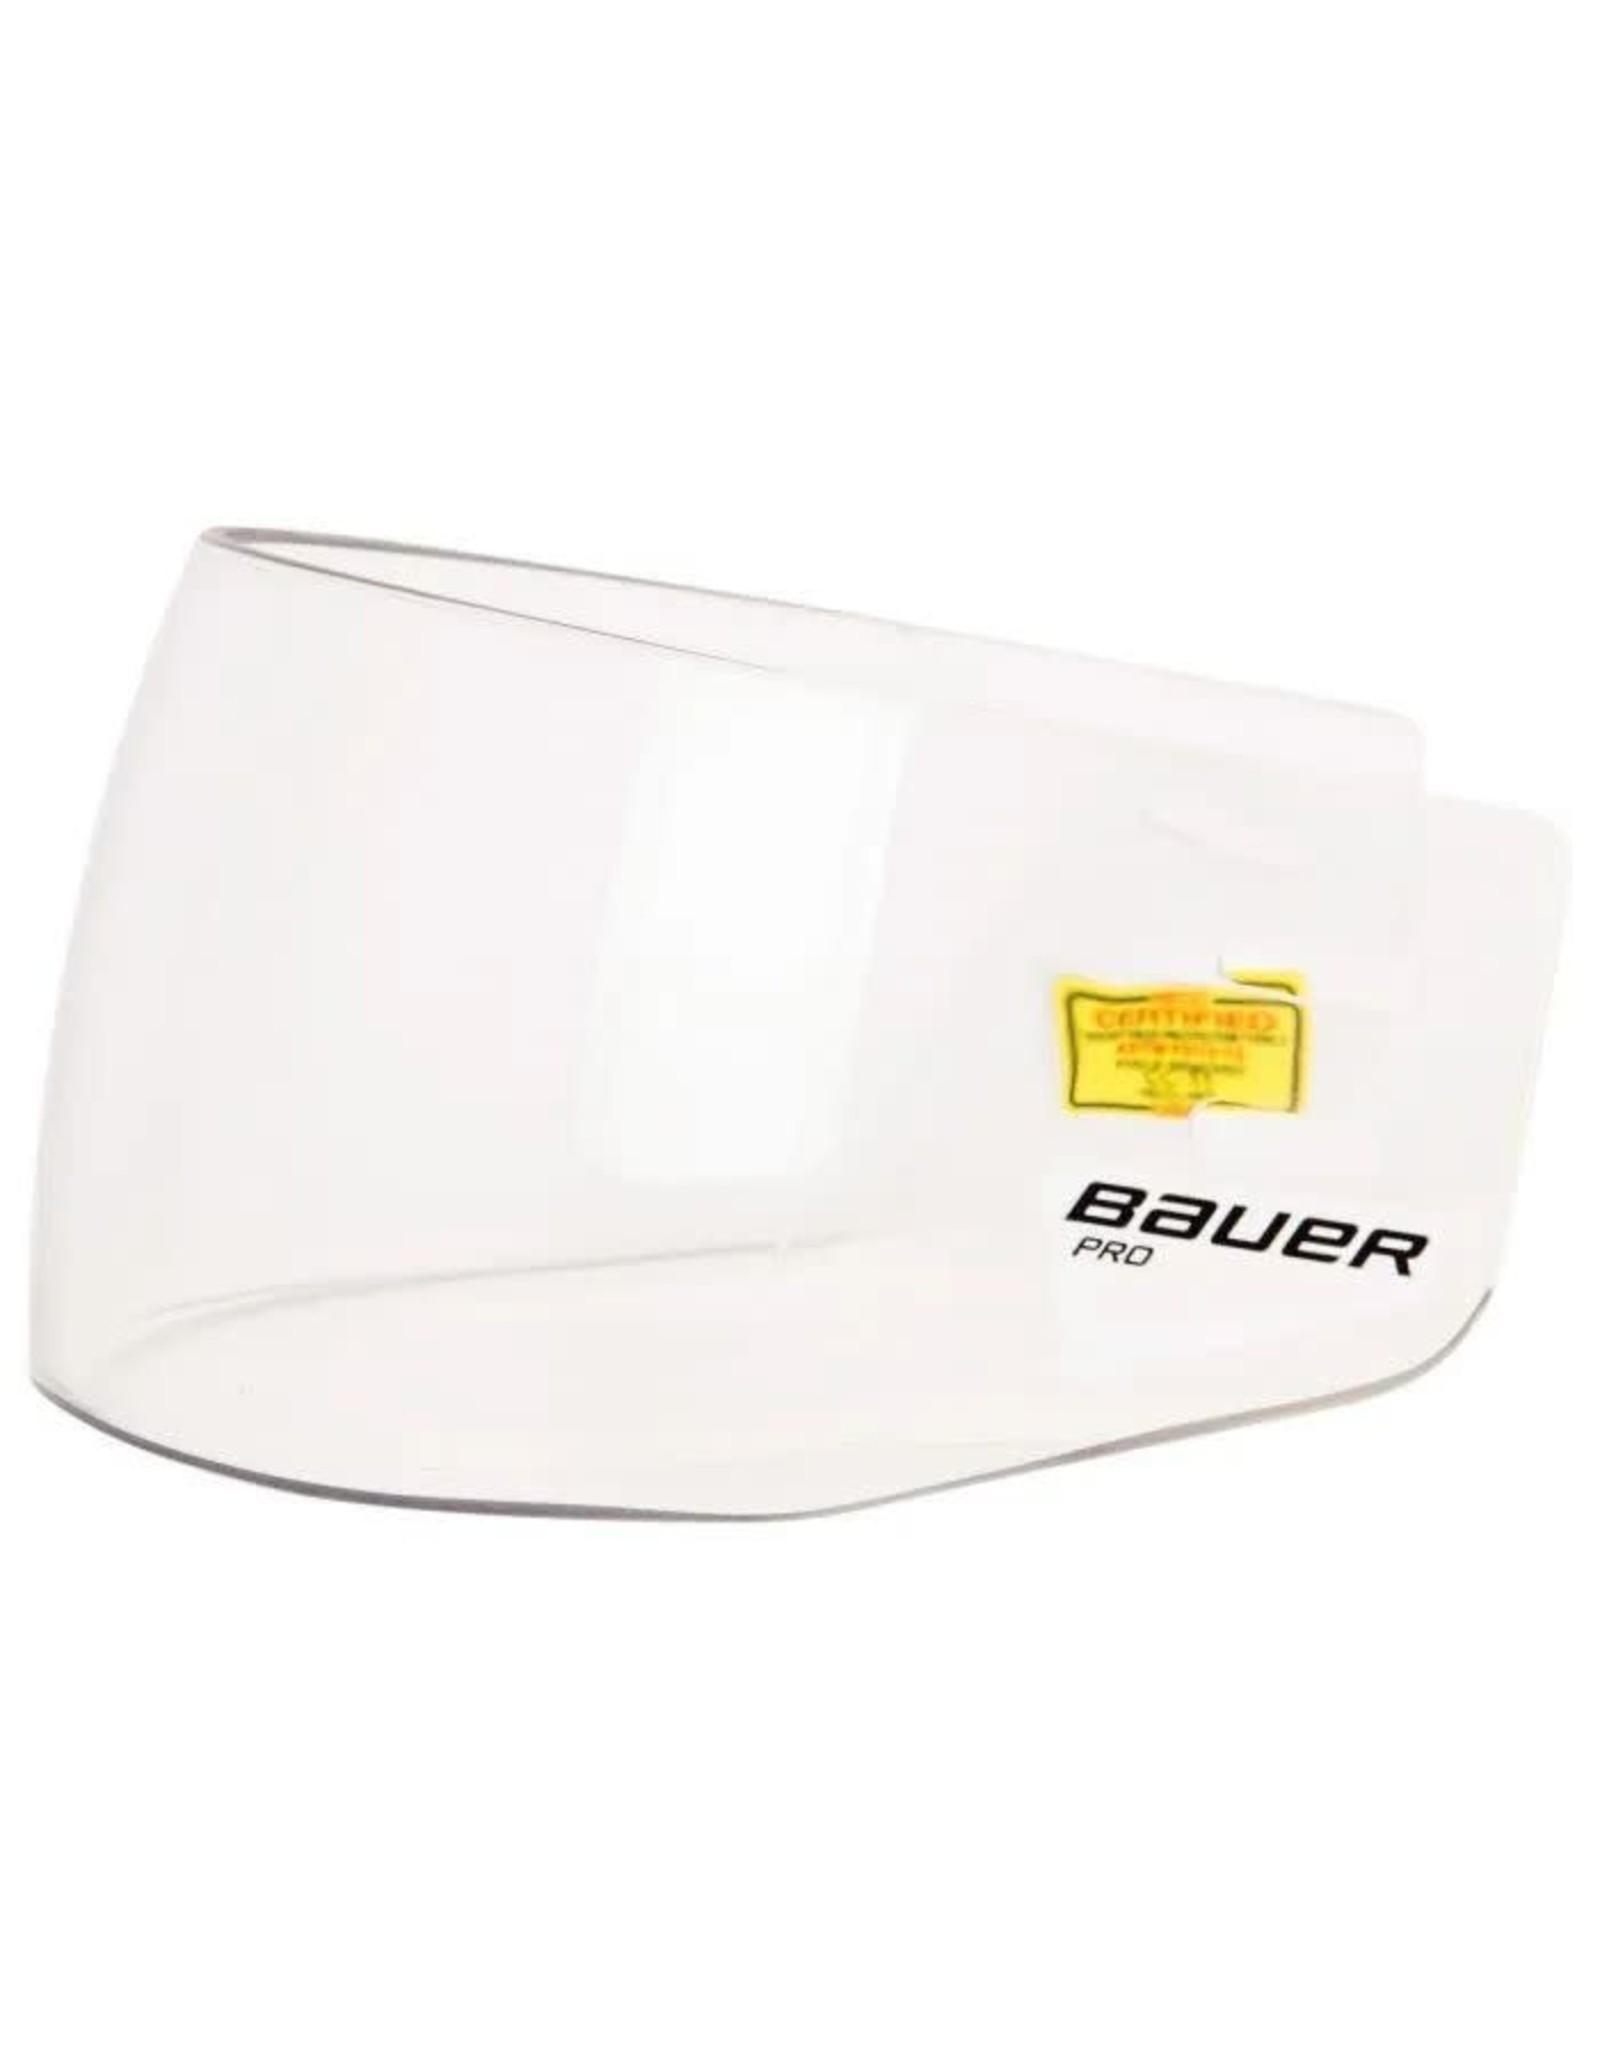 BAUER Pro, Straight Visor Clear - '17 Model